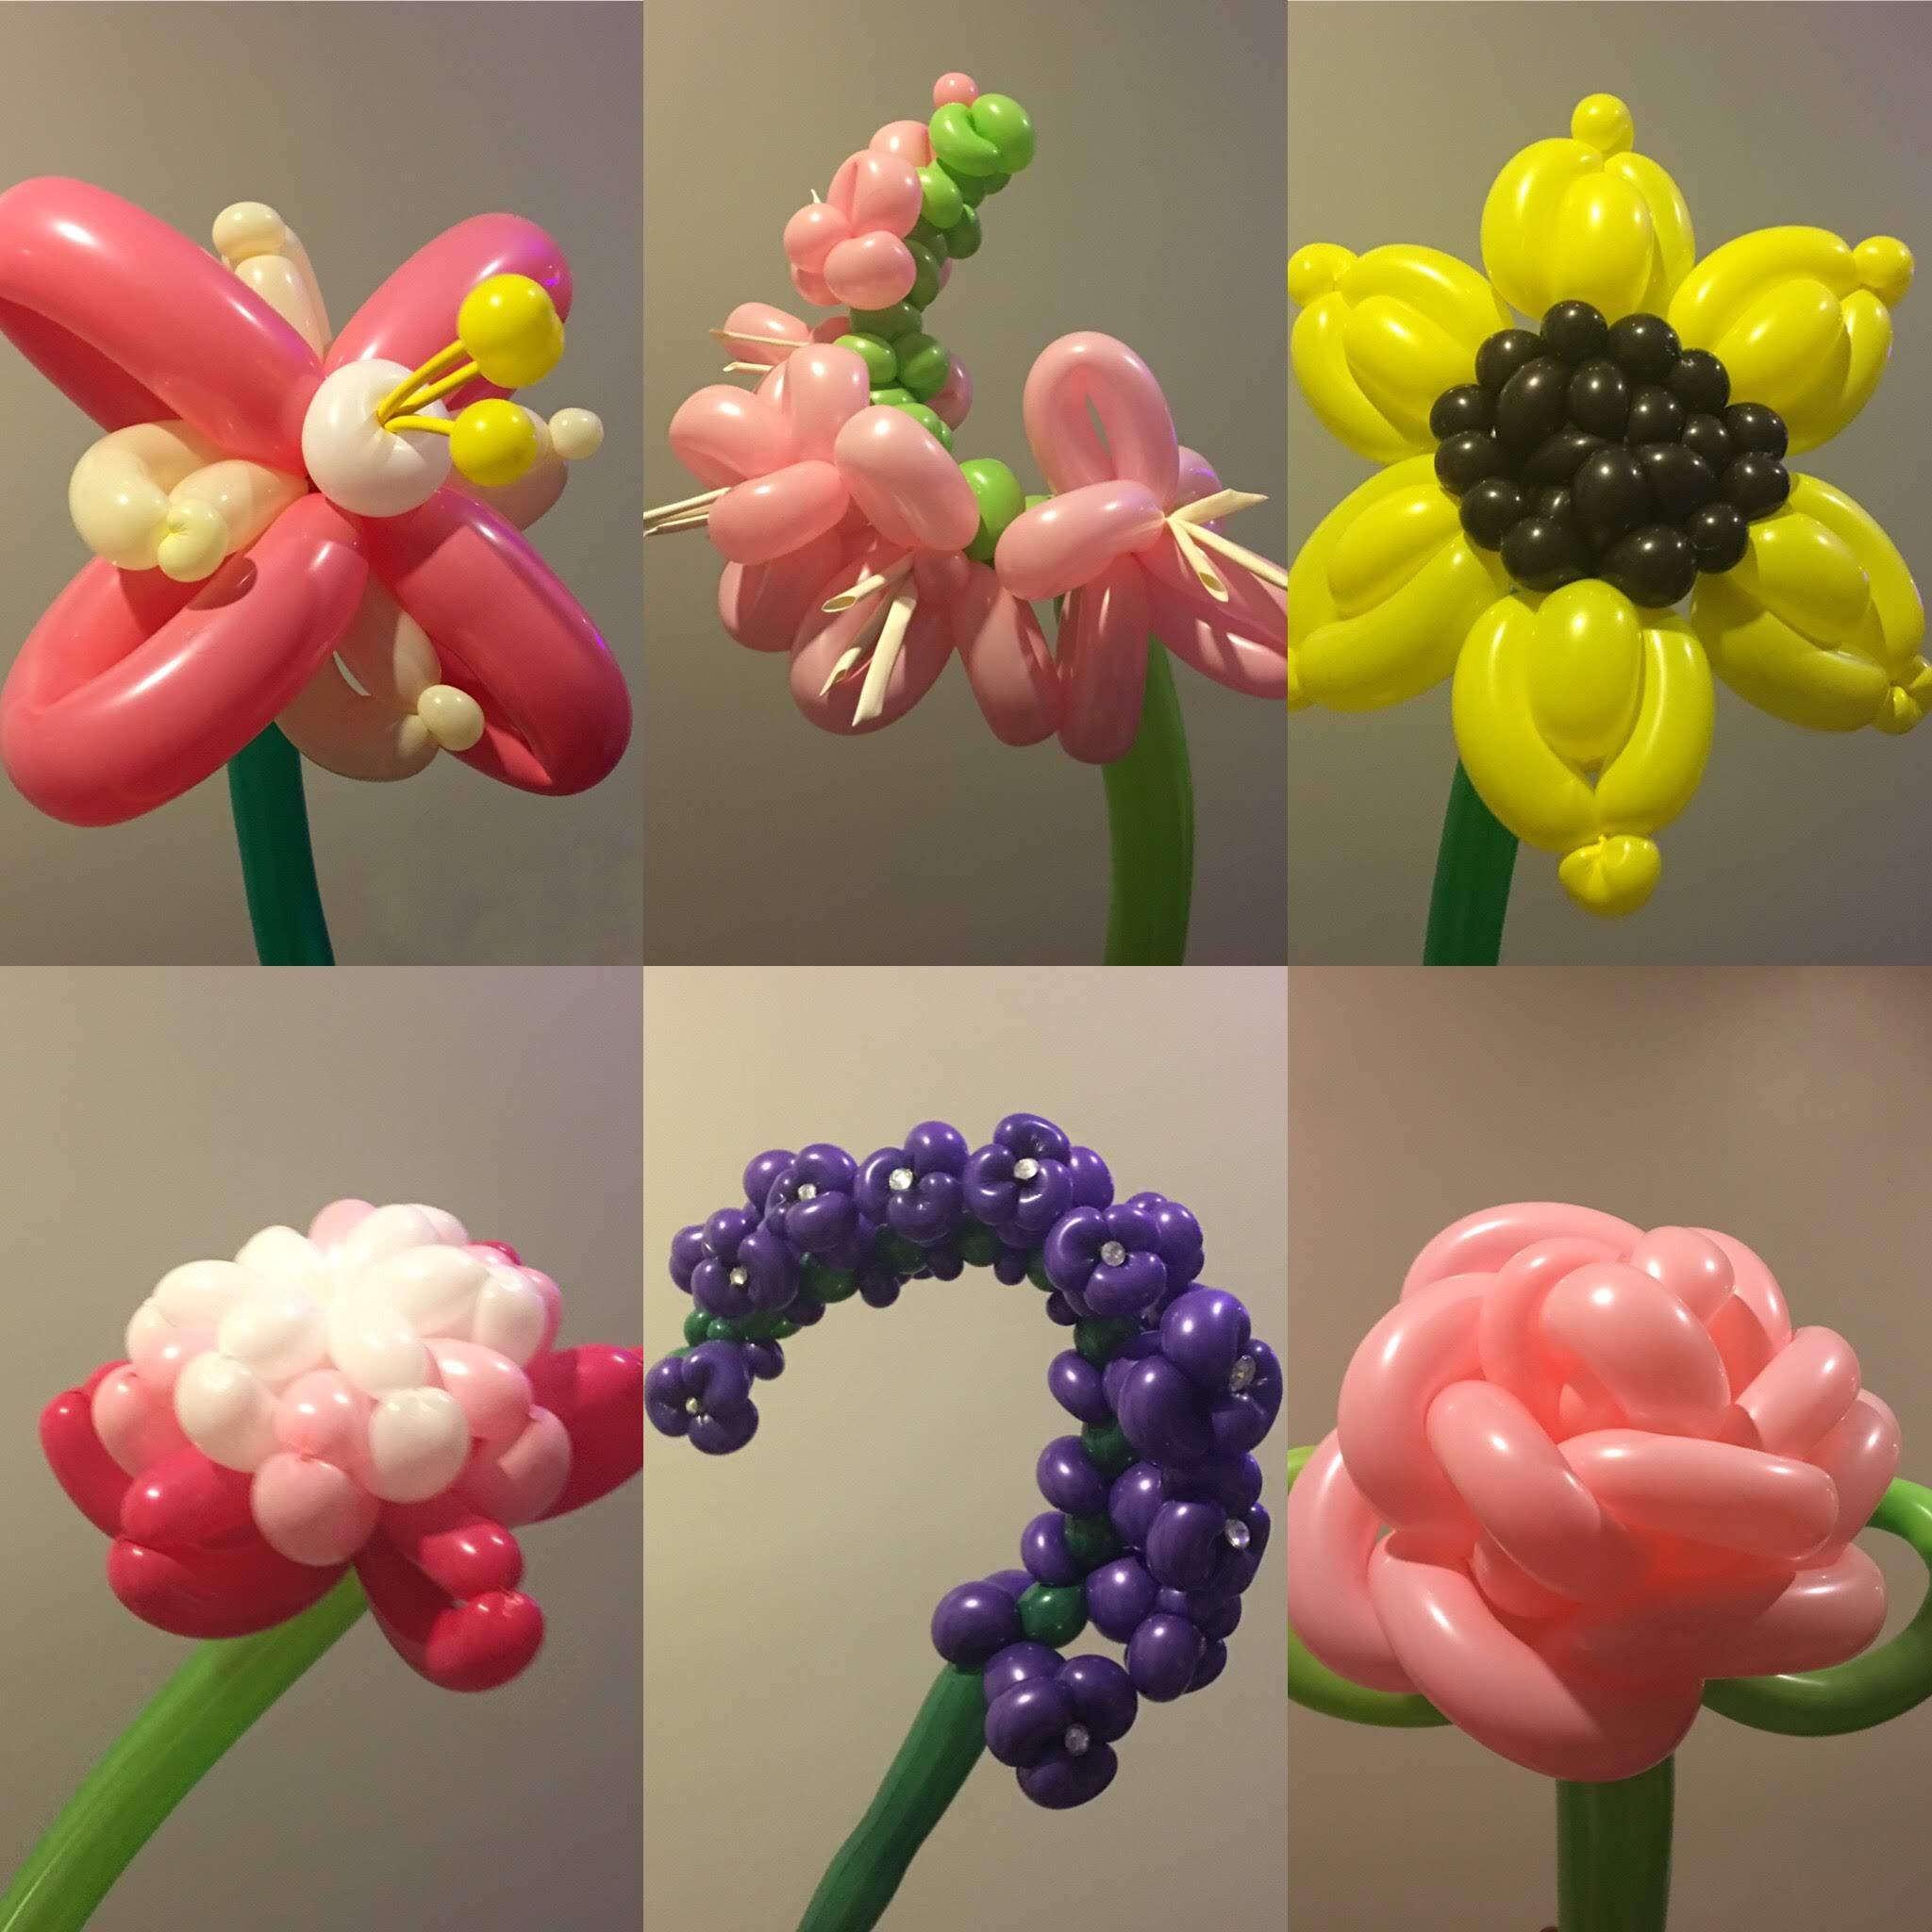 Platinum-Tier Balloon Flowers examples